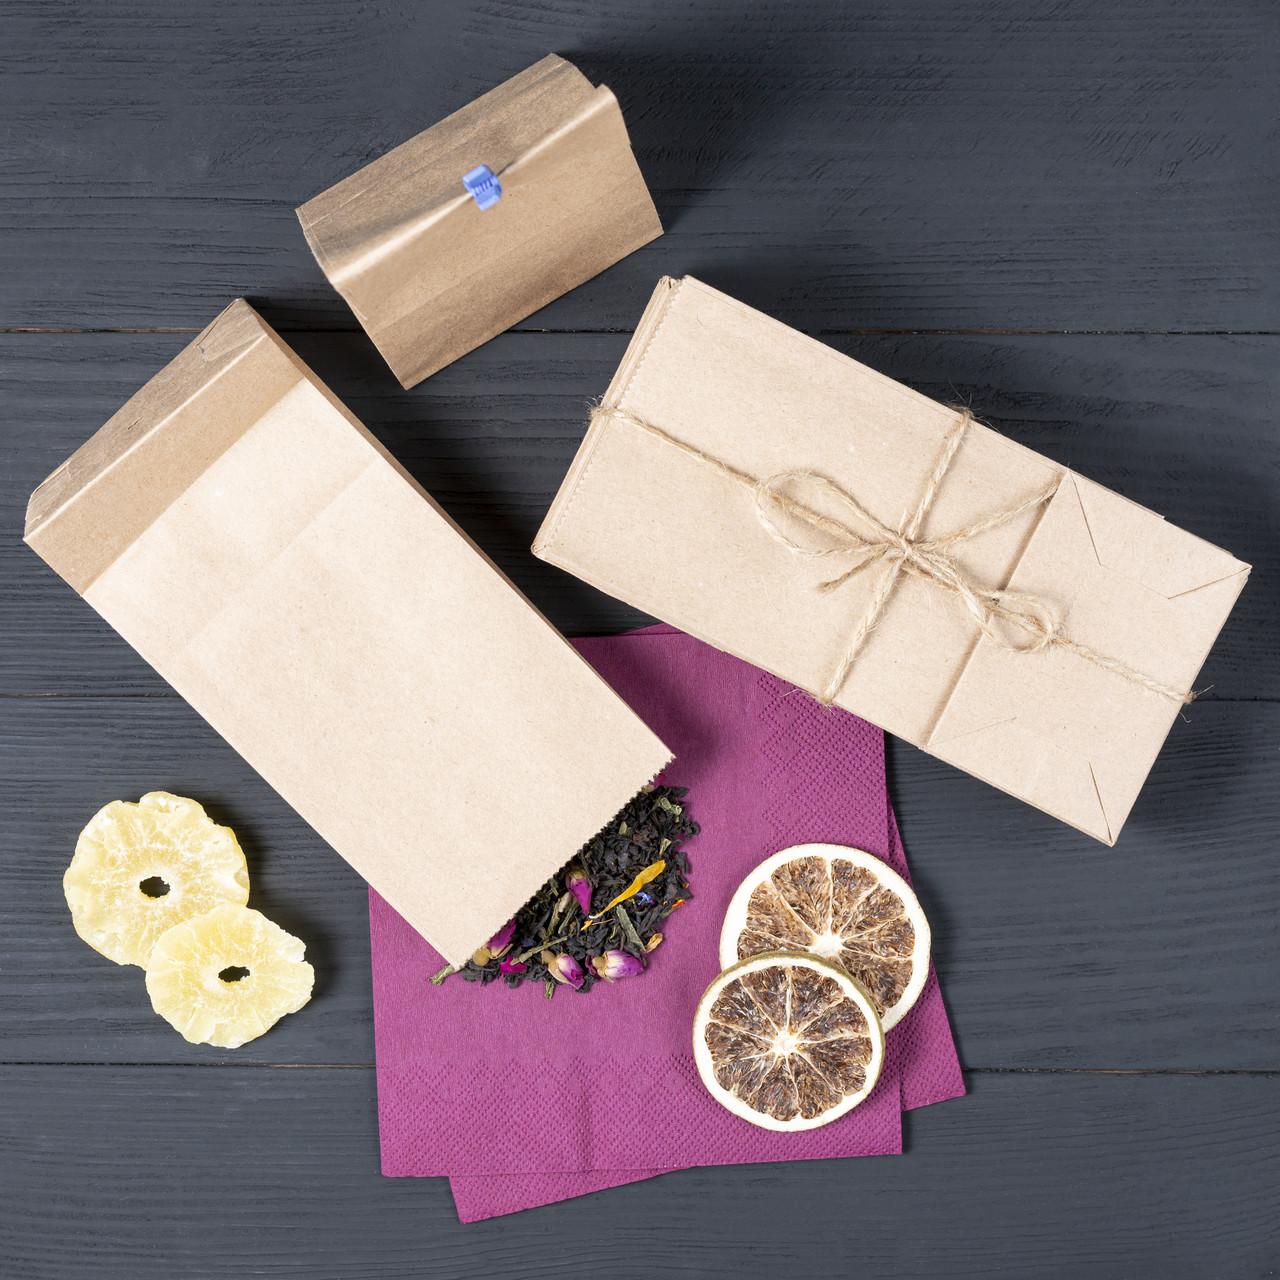 Пакет паперовий з дном 95*65*190 мм бурий фасувальний крафт пакет